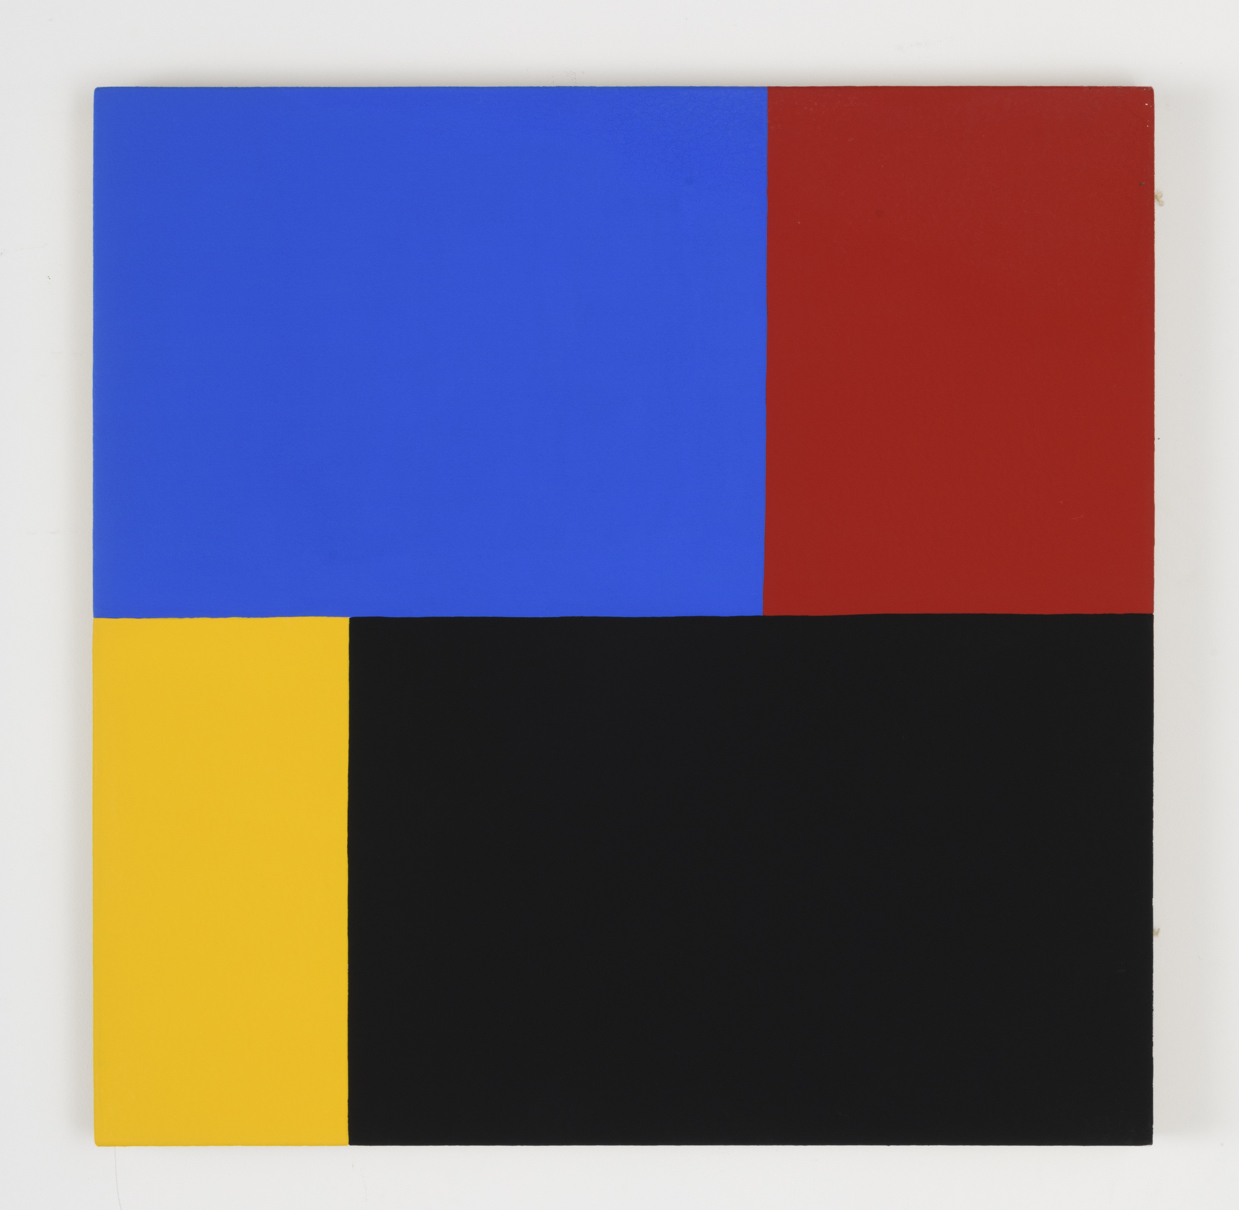 Edith Baumann  Untitled #3,  1977 acrylic on canvas 26 - 1/4 x 26 -1/4 inches